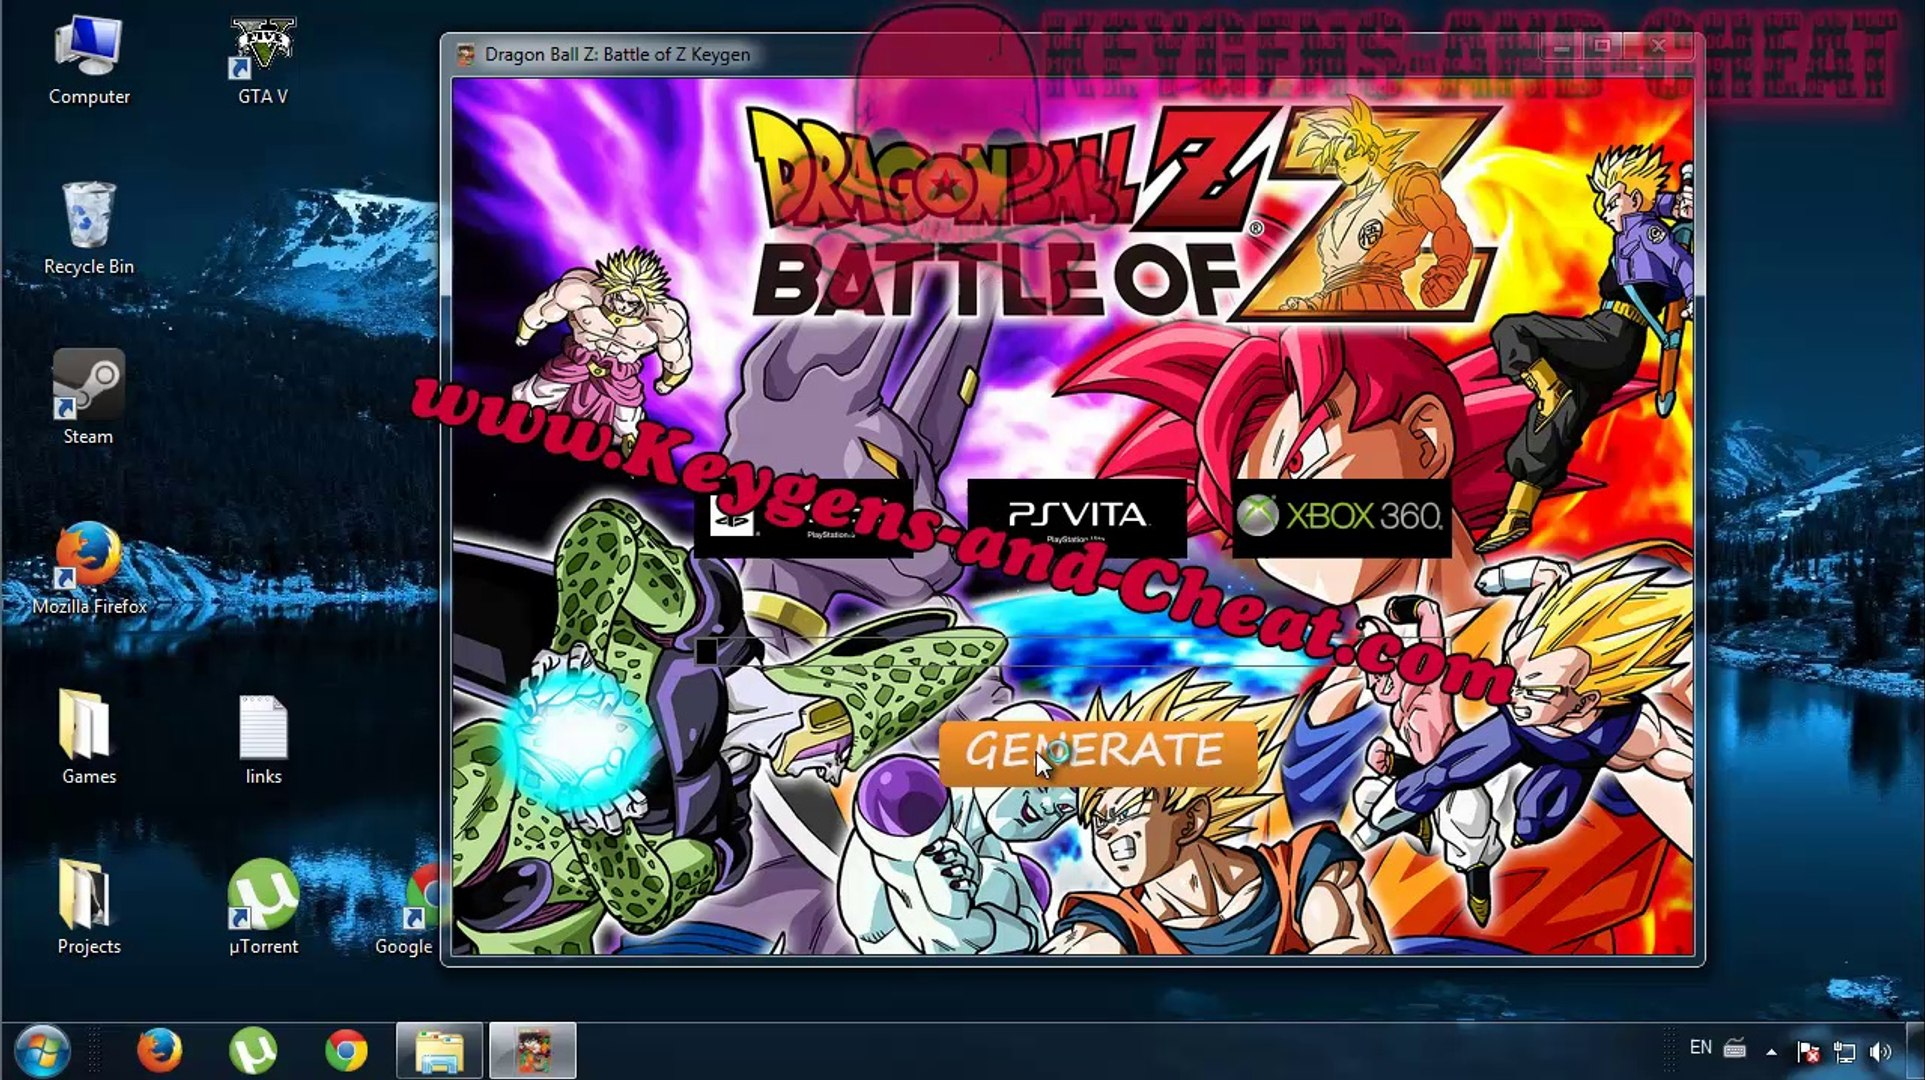 DragonBall Z Battle Of Z Keygen - Vidéo dailymotion